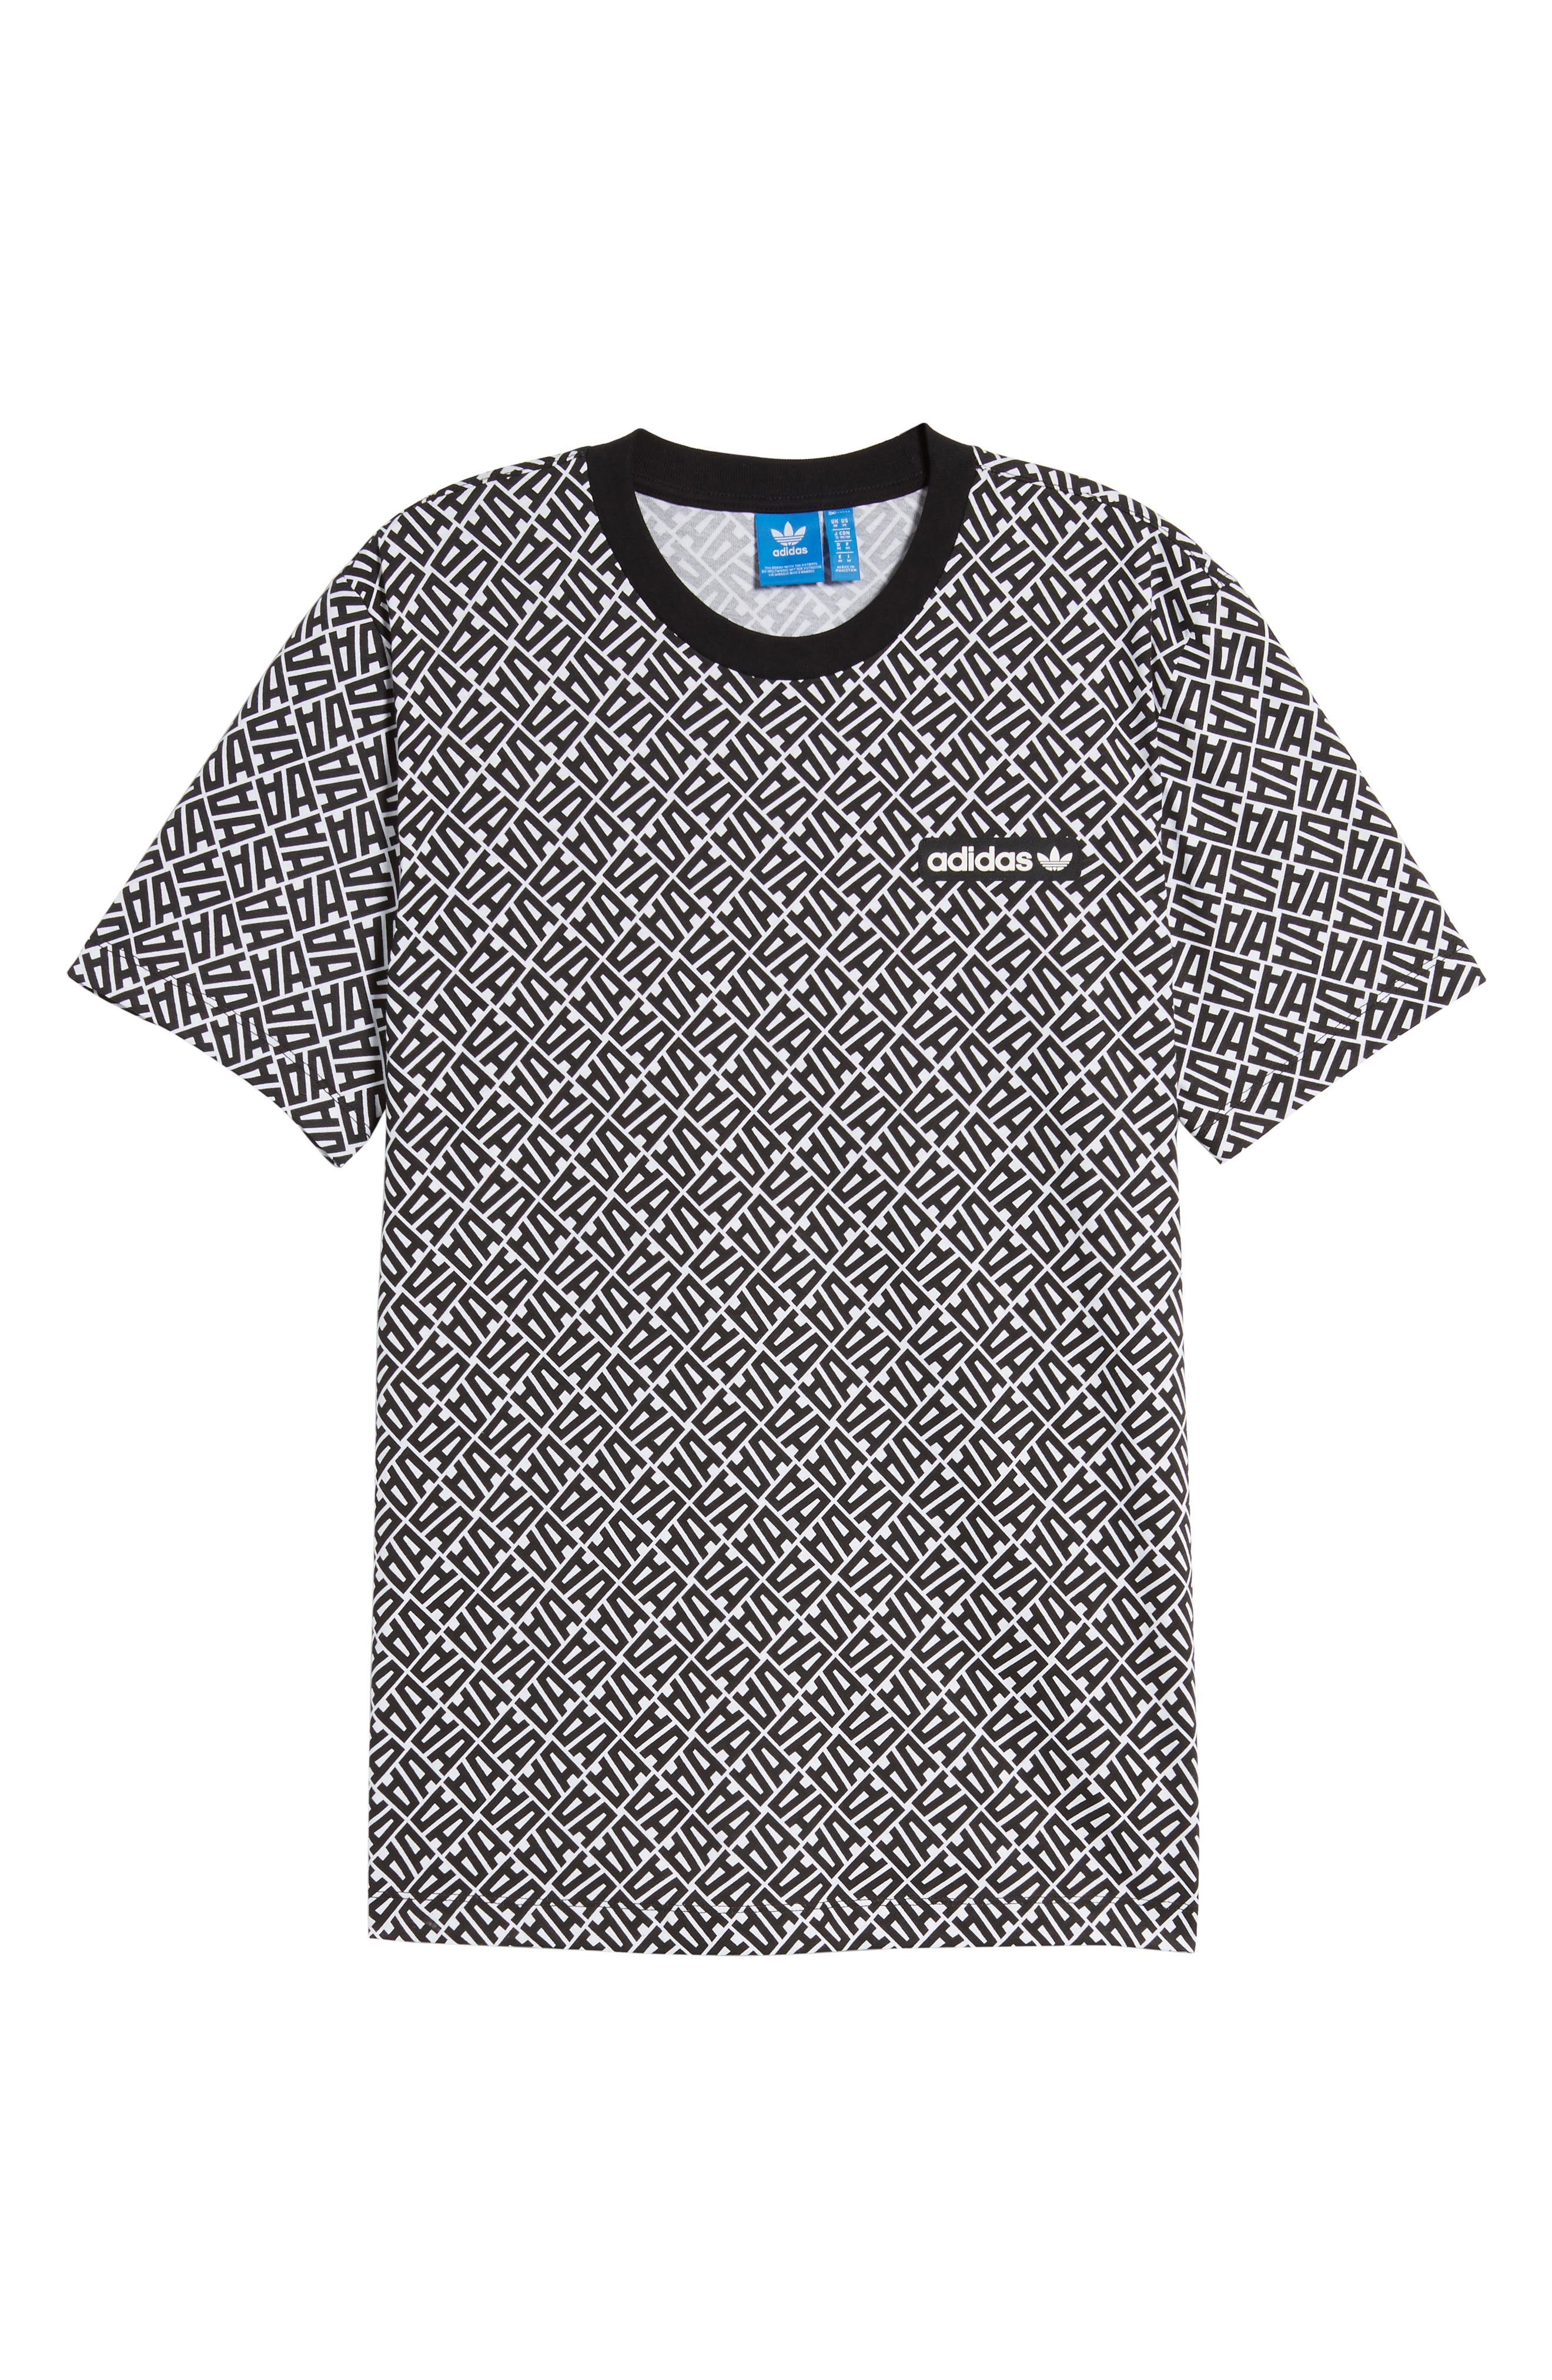 Originals Anichkov T-Shirt,                             Alternate thumbnail 6, color,                             001